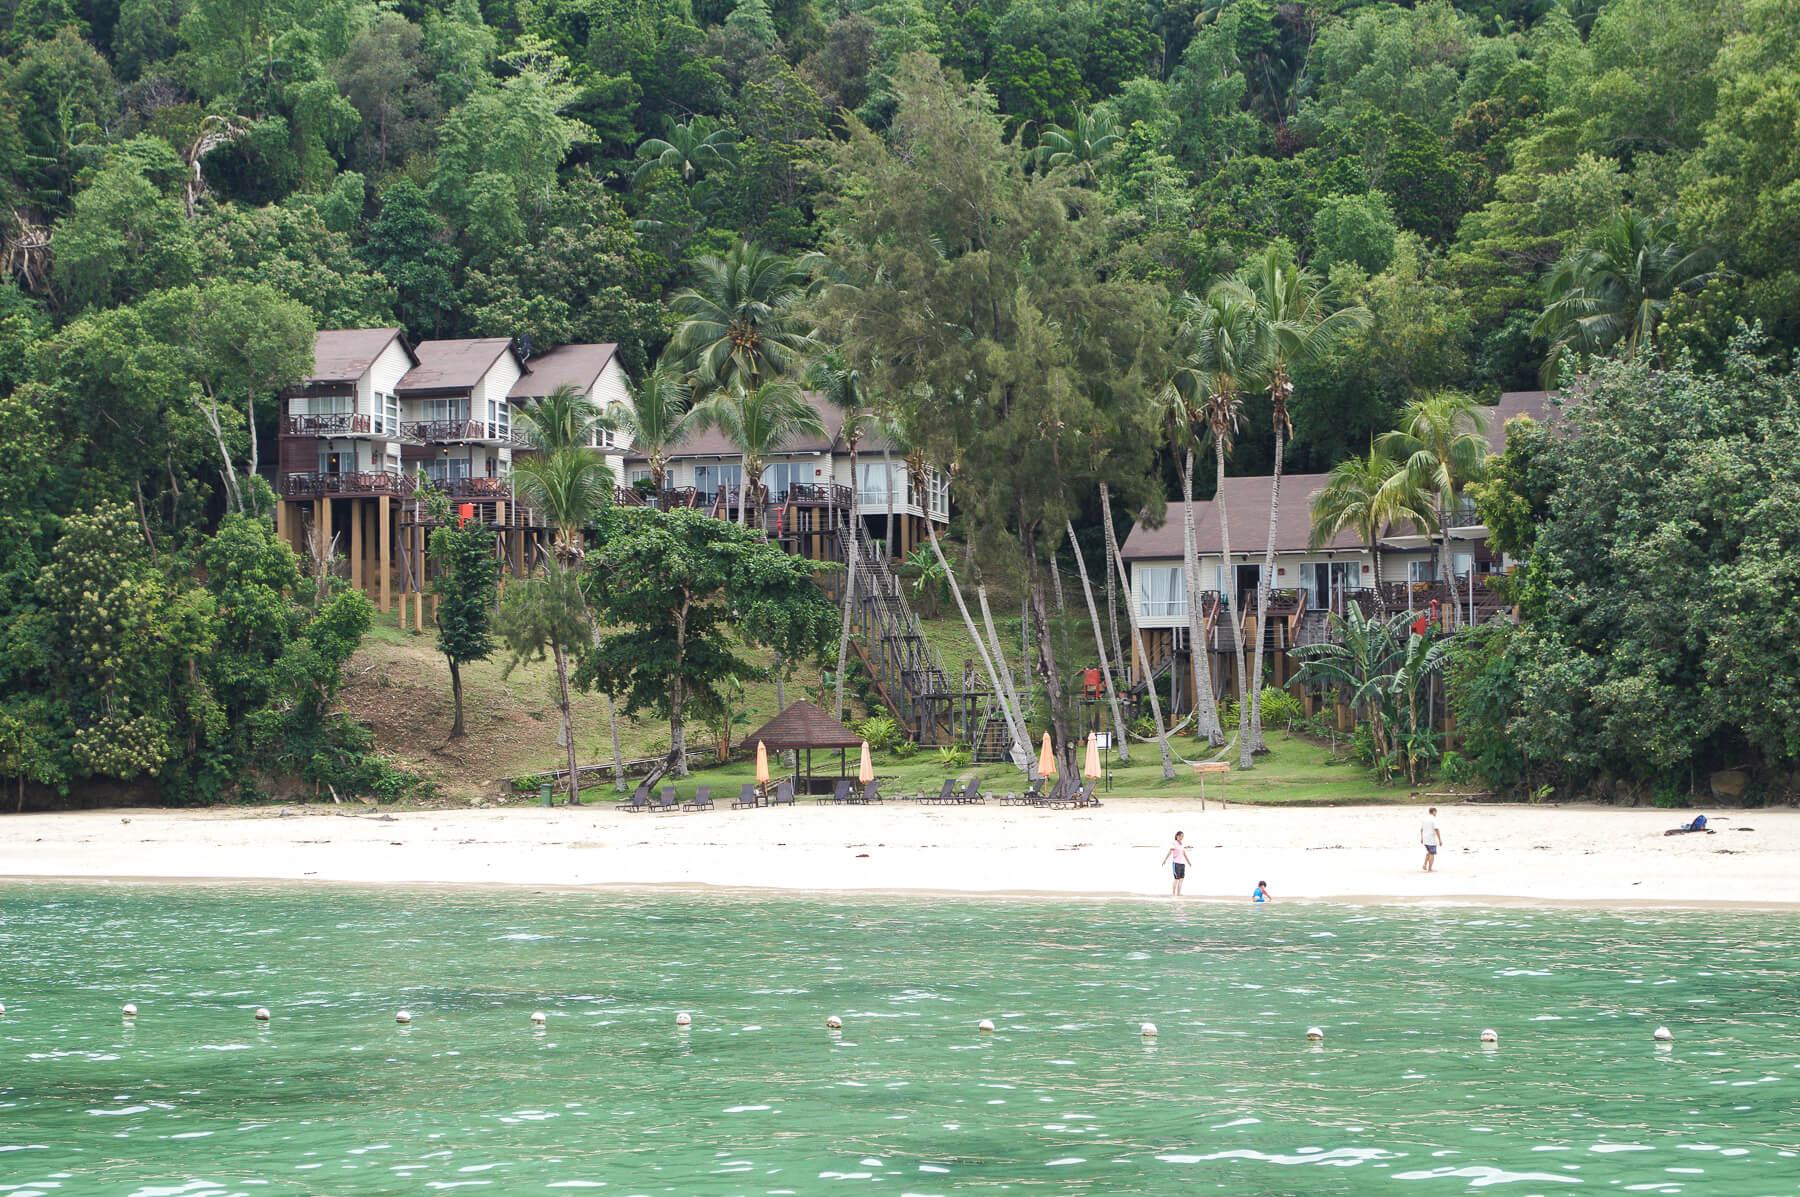 Resort on the beach of Manukan Island